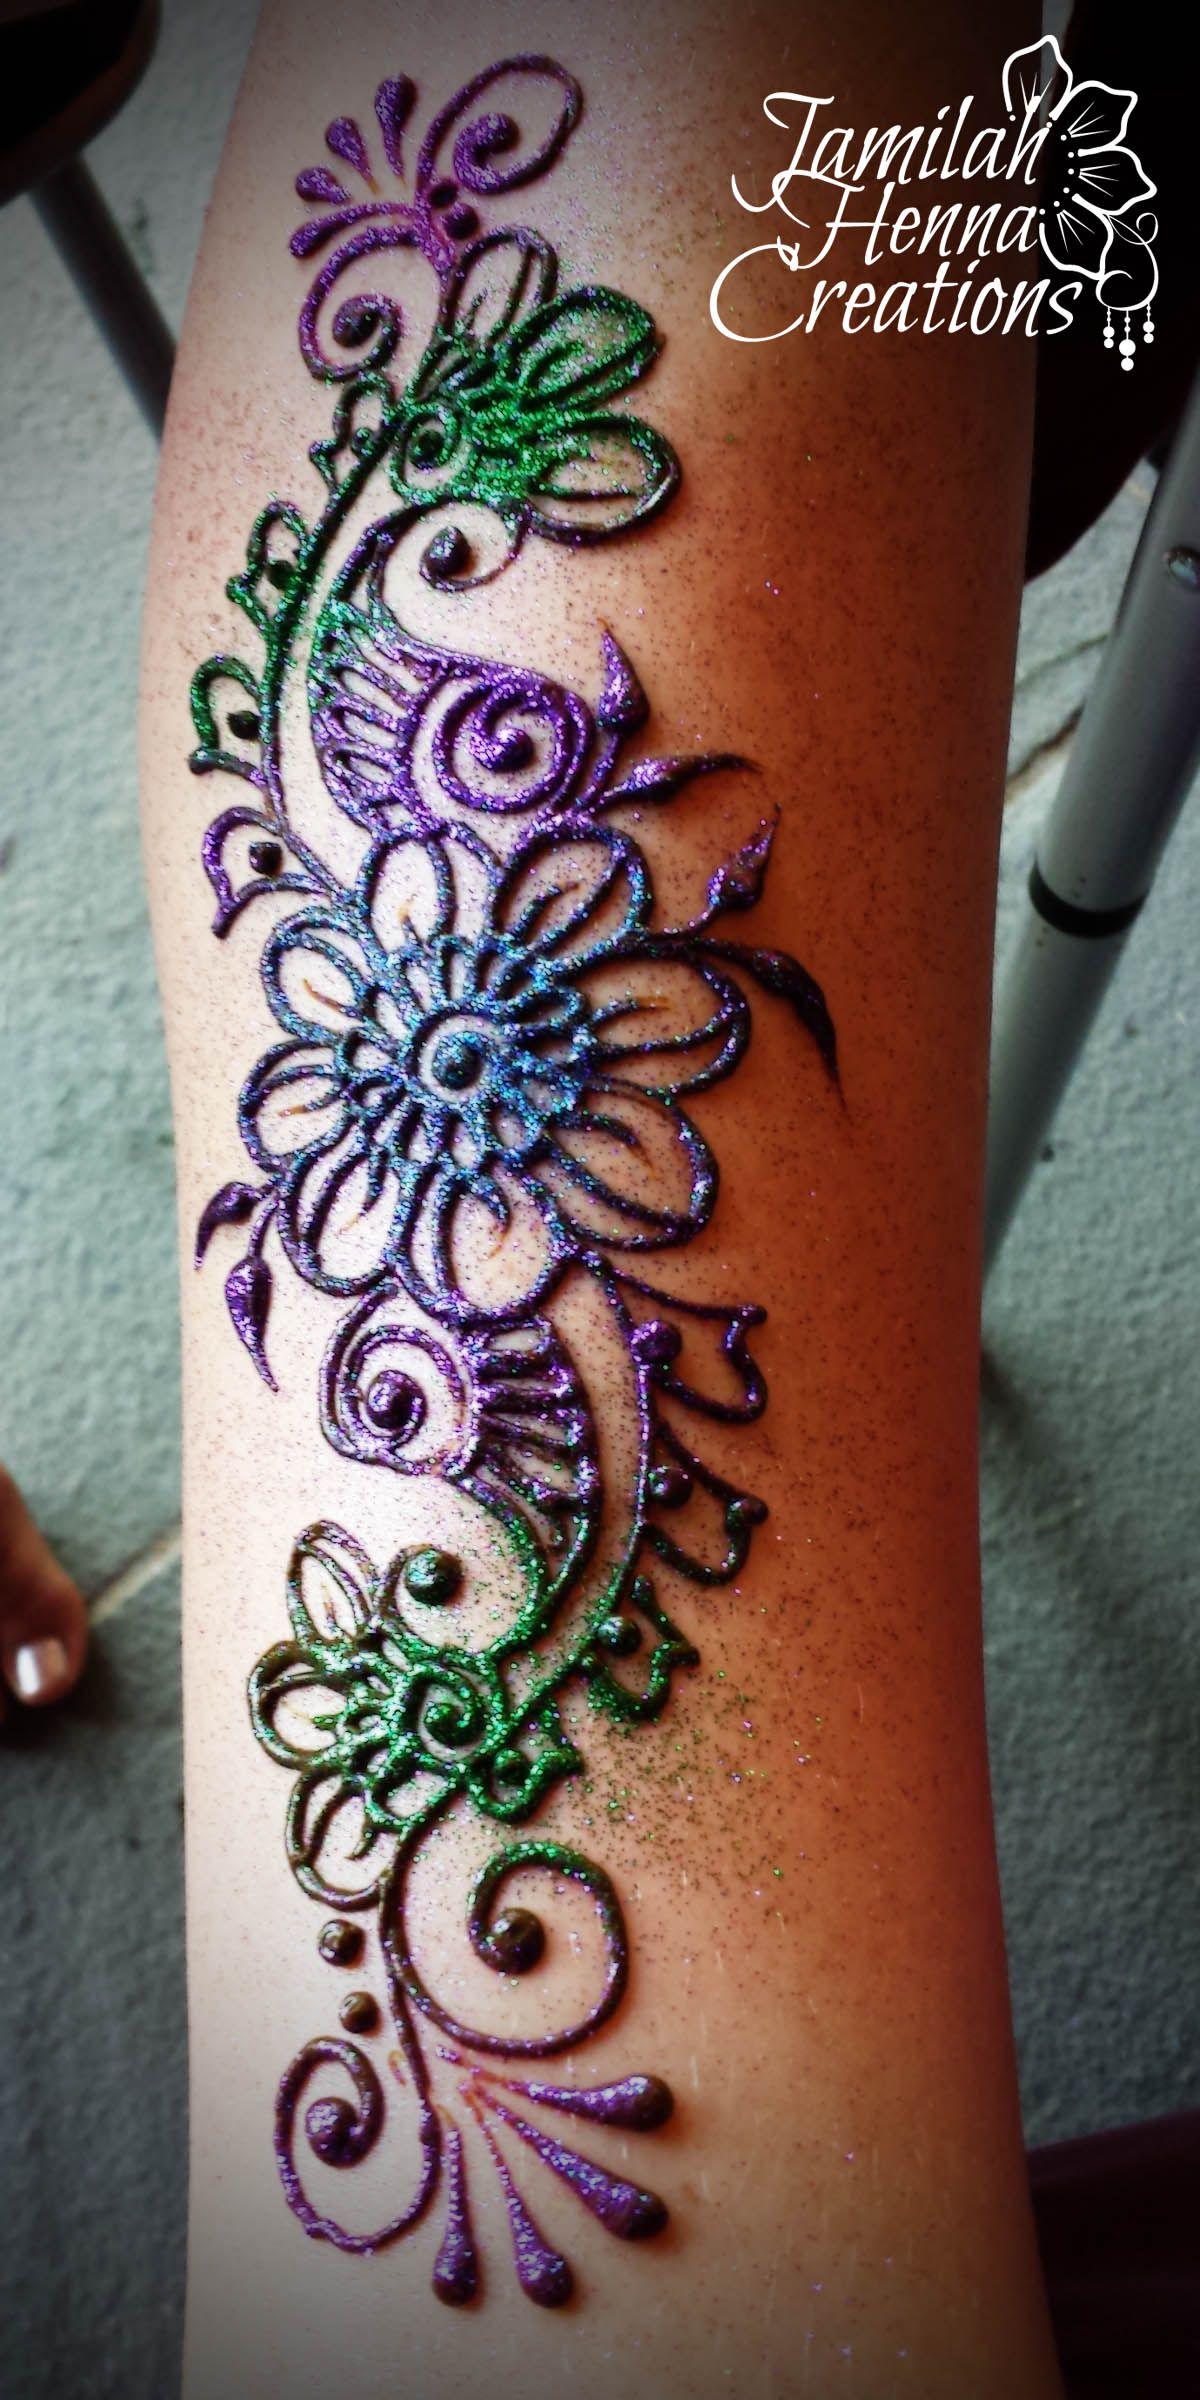 Colored Henna Tattoo: Henna With Multi Colored Glitter Www.JamilahHennaCreations